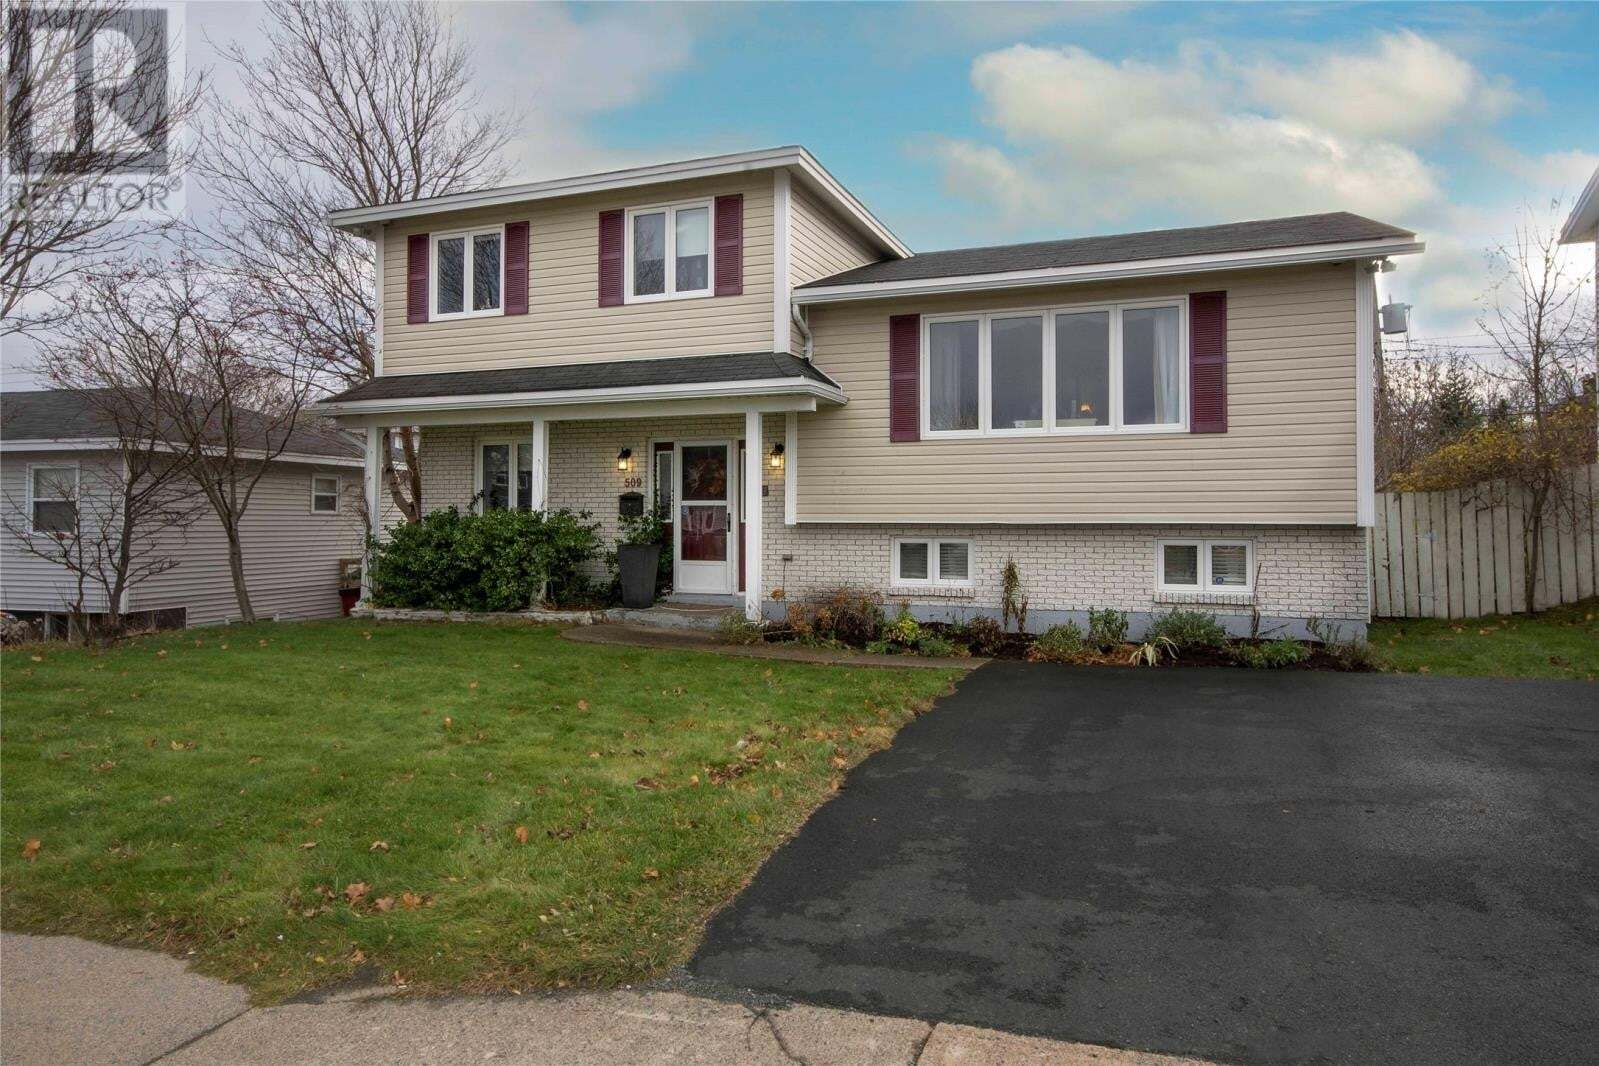 House for sale at 509 Newfoundland Dr St. John's Newfoundland - MLS: 1221598